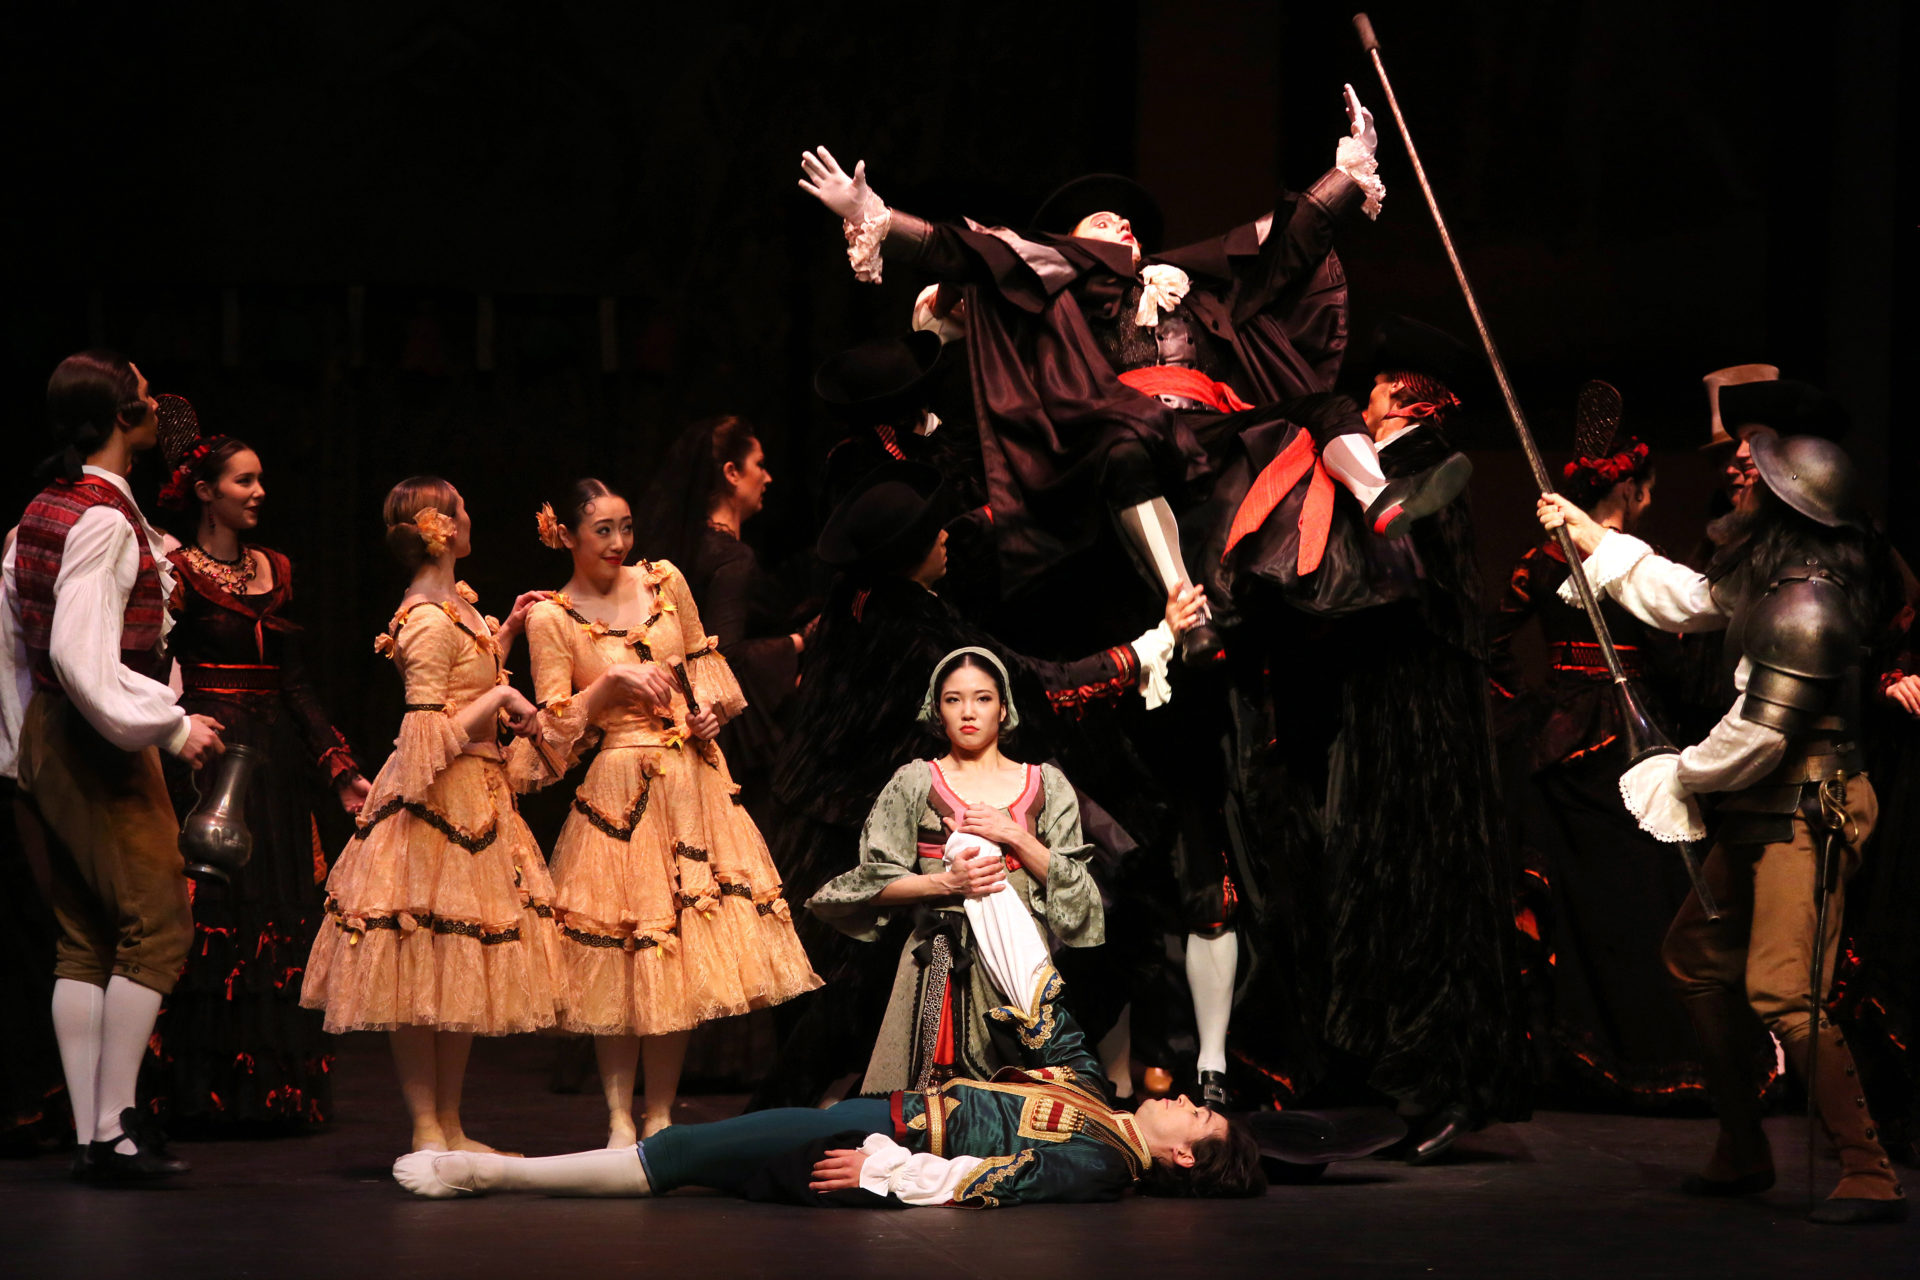 Don_Quixote_HH_Ballett_Foto_AnjaBeutler.de_585